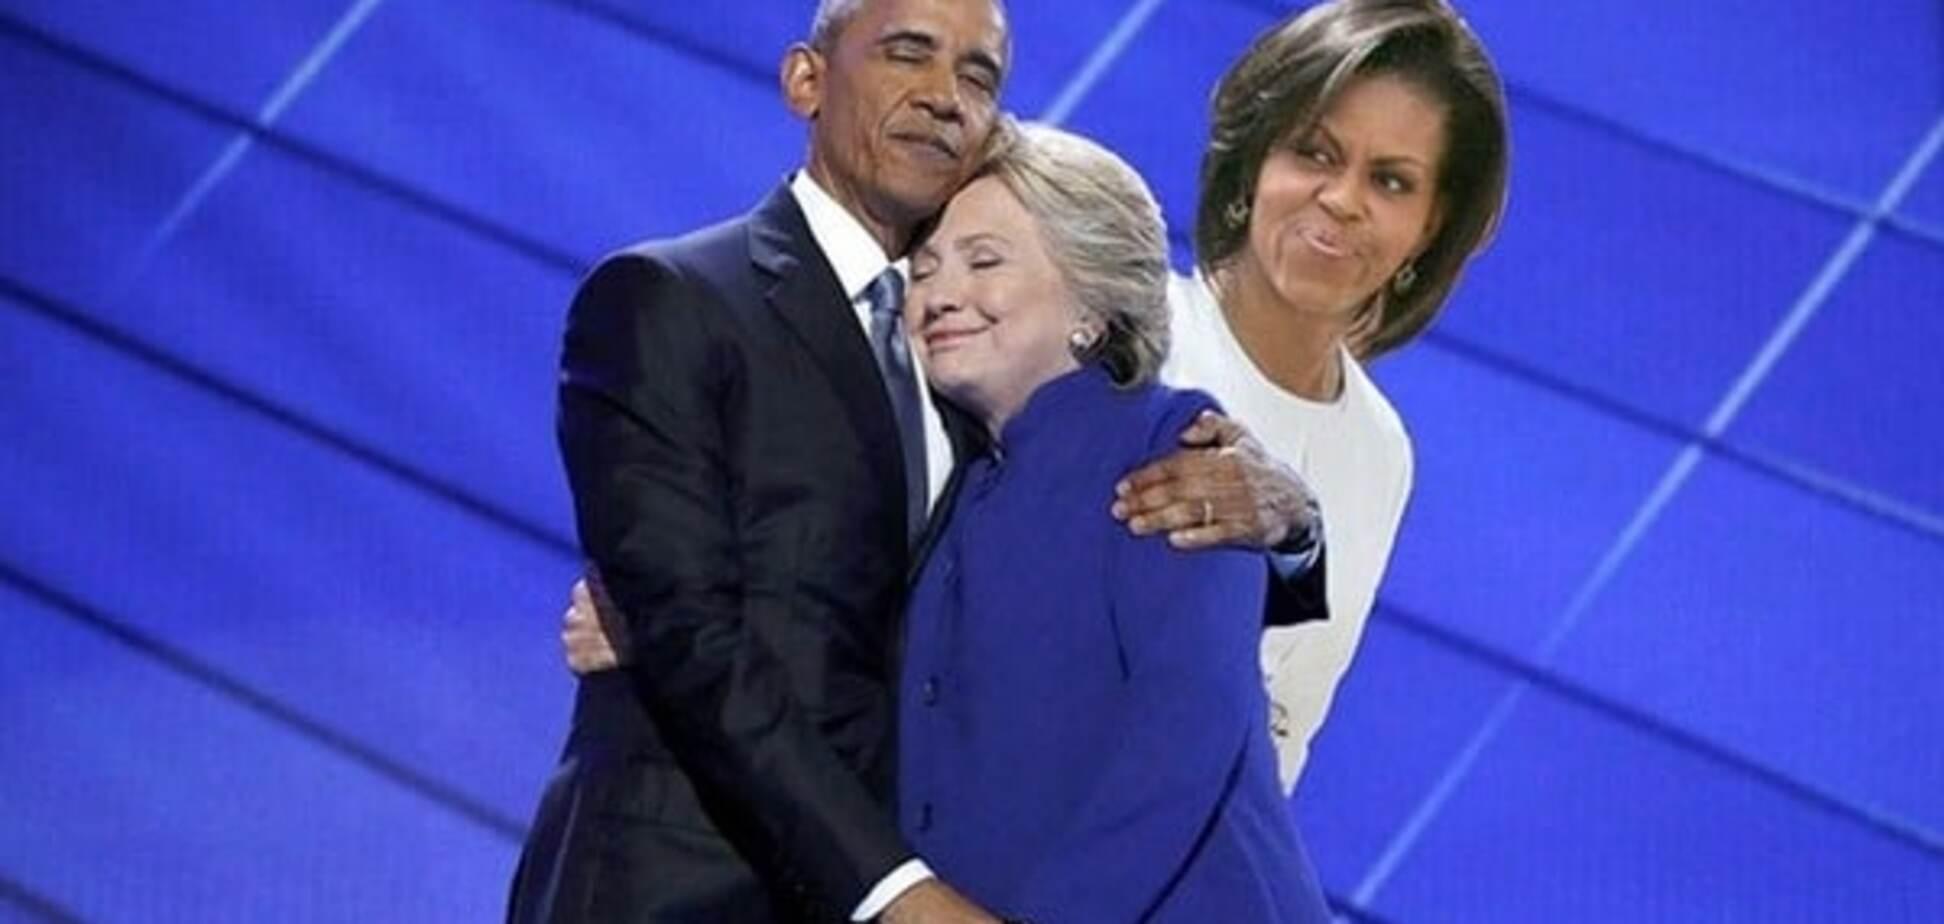 Объятия Барака Обамы и Хилари Клинтон